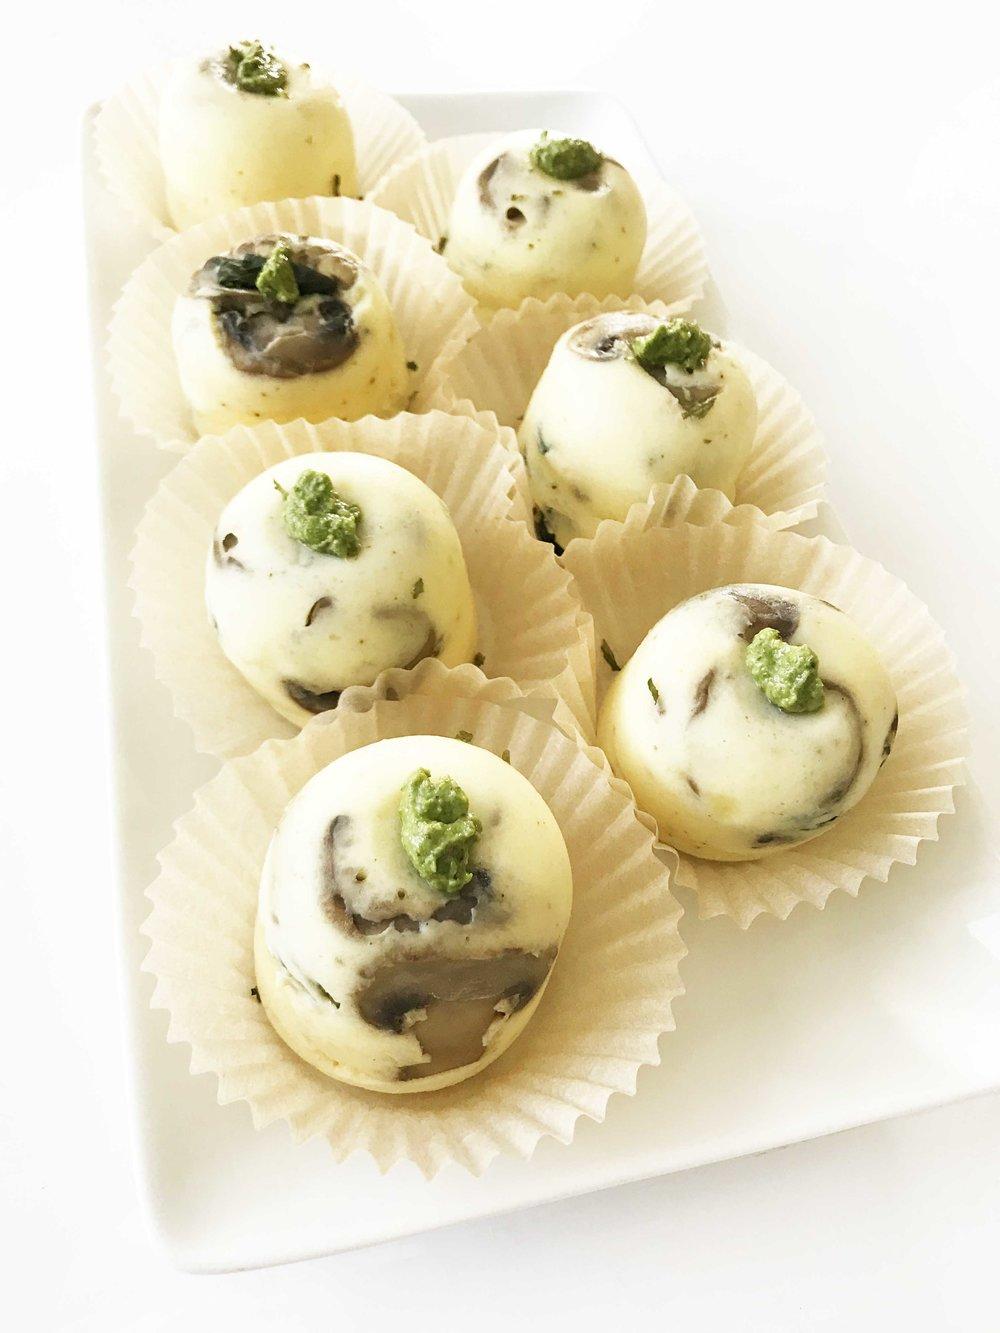 spinach-mushroom-egg-bites12.jpg